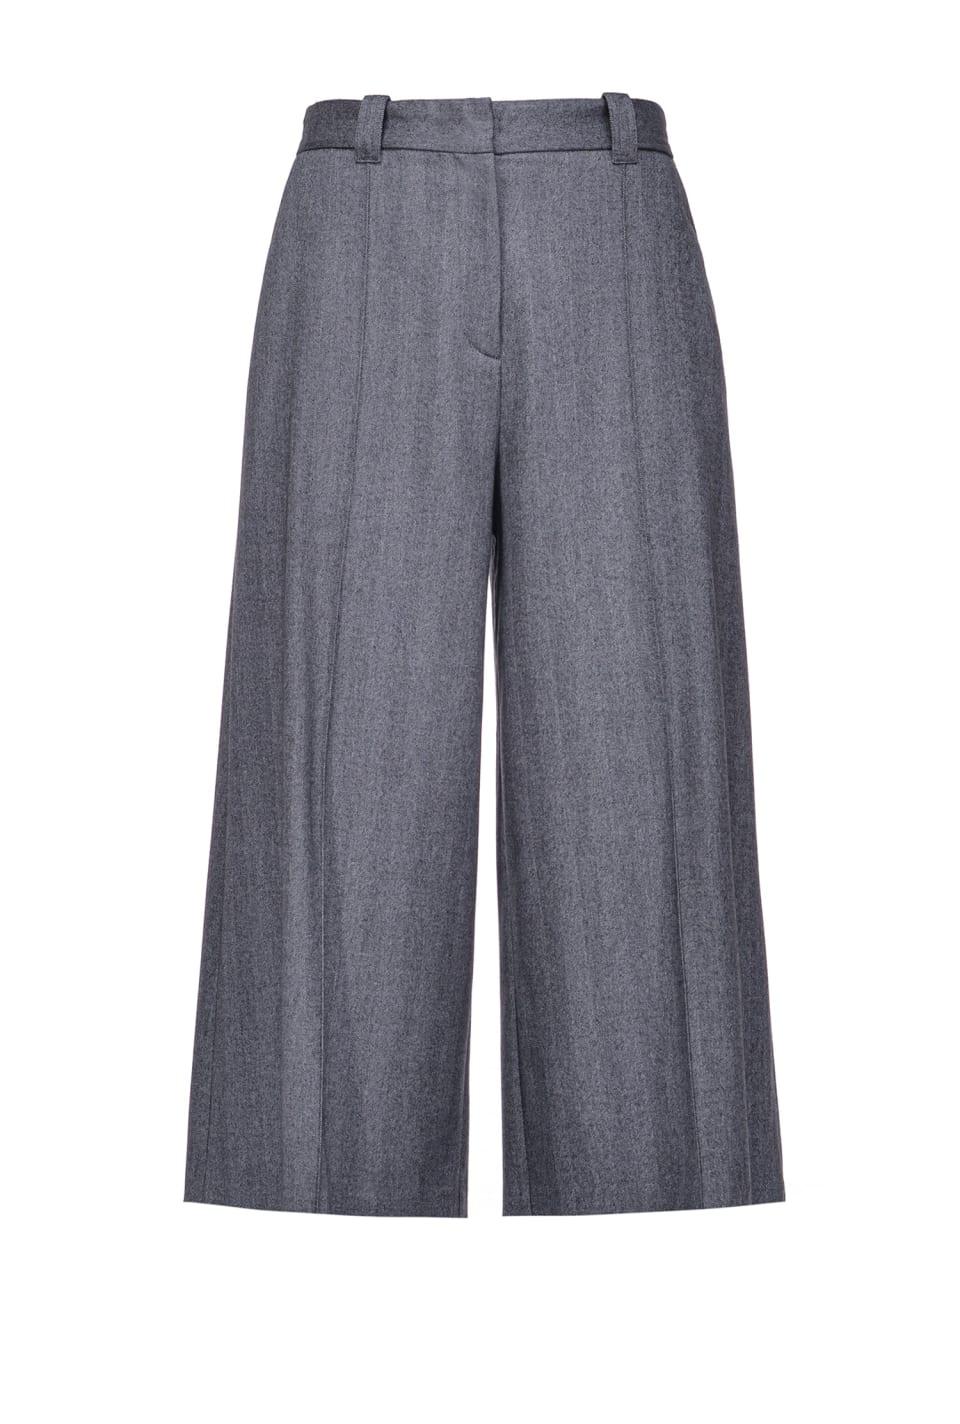 Chevron pattern culottes